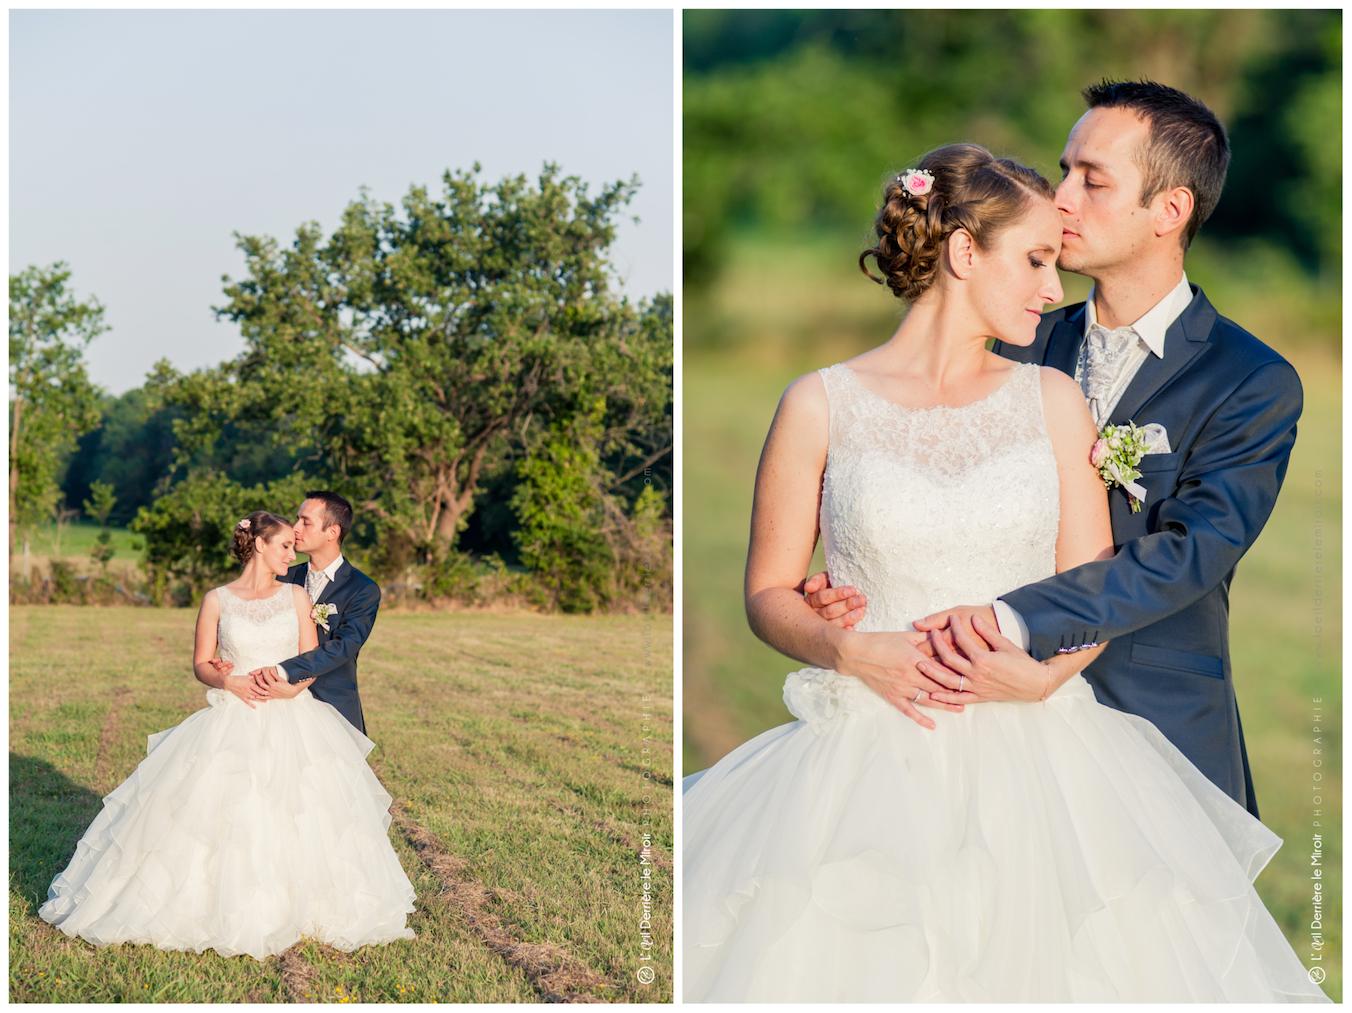 photographe-mariage-06-chateau-vaugrenier-18